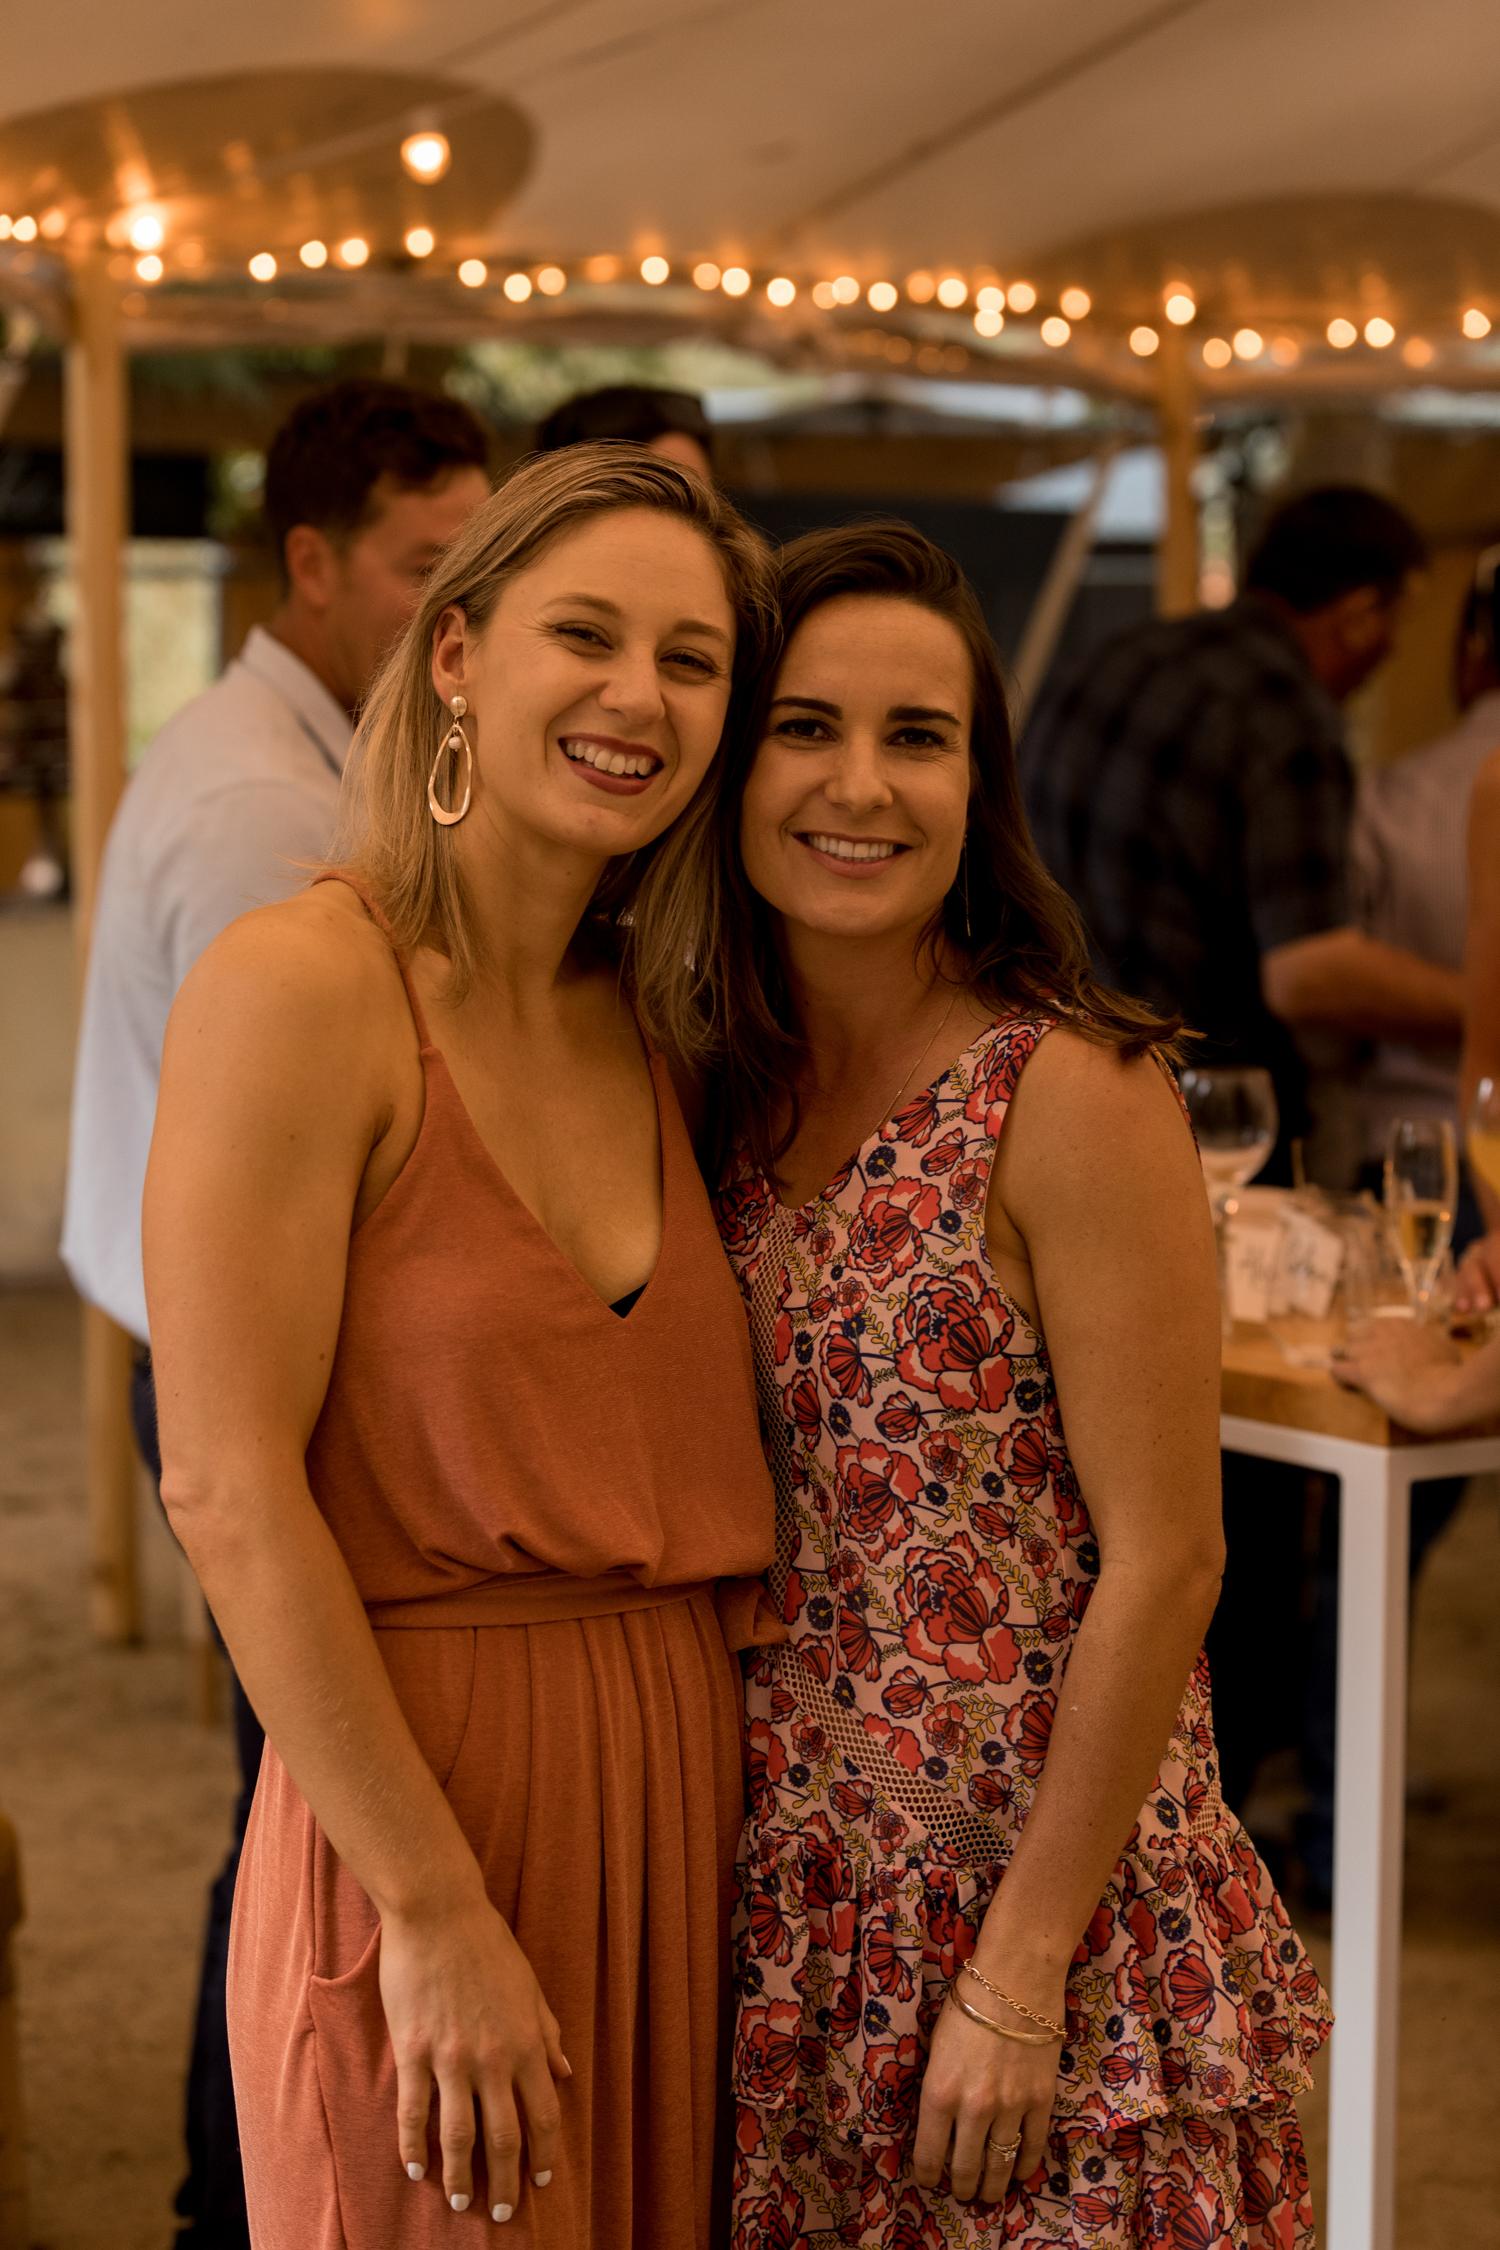 black-barn-winery-wedding-hawkes-bay-wedding-photographer-friends-together.jpg